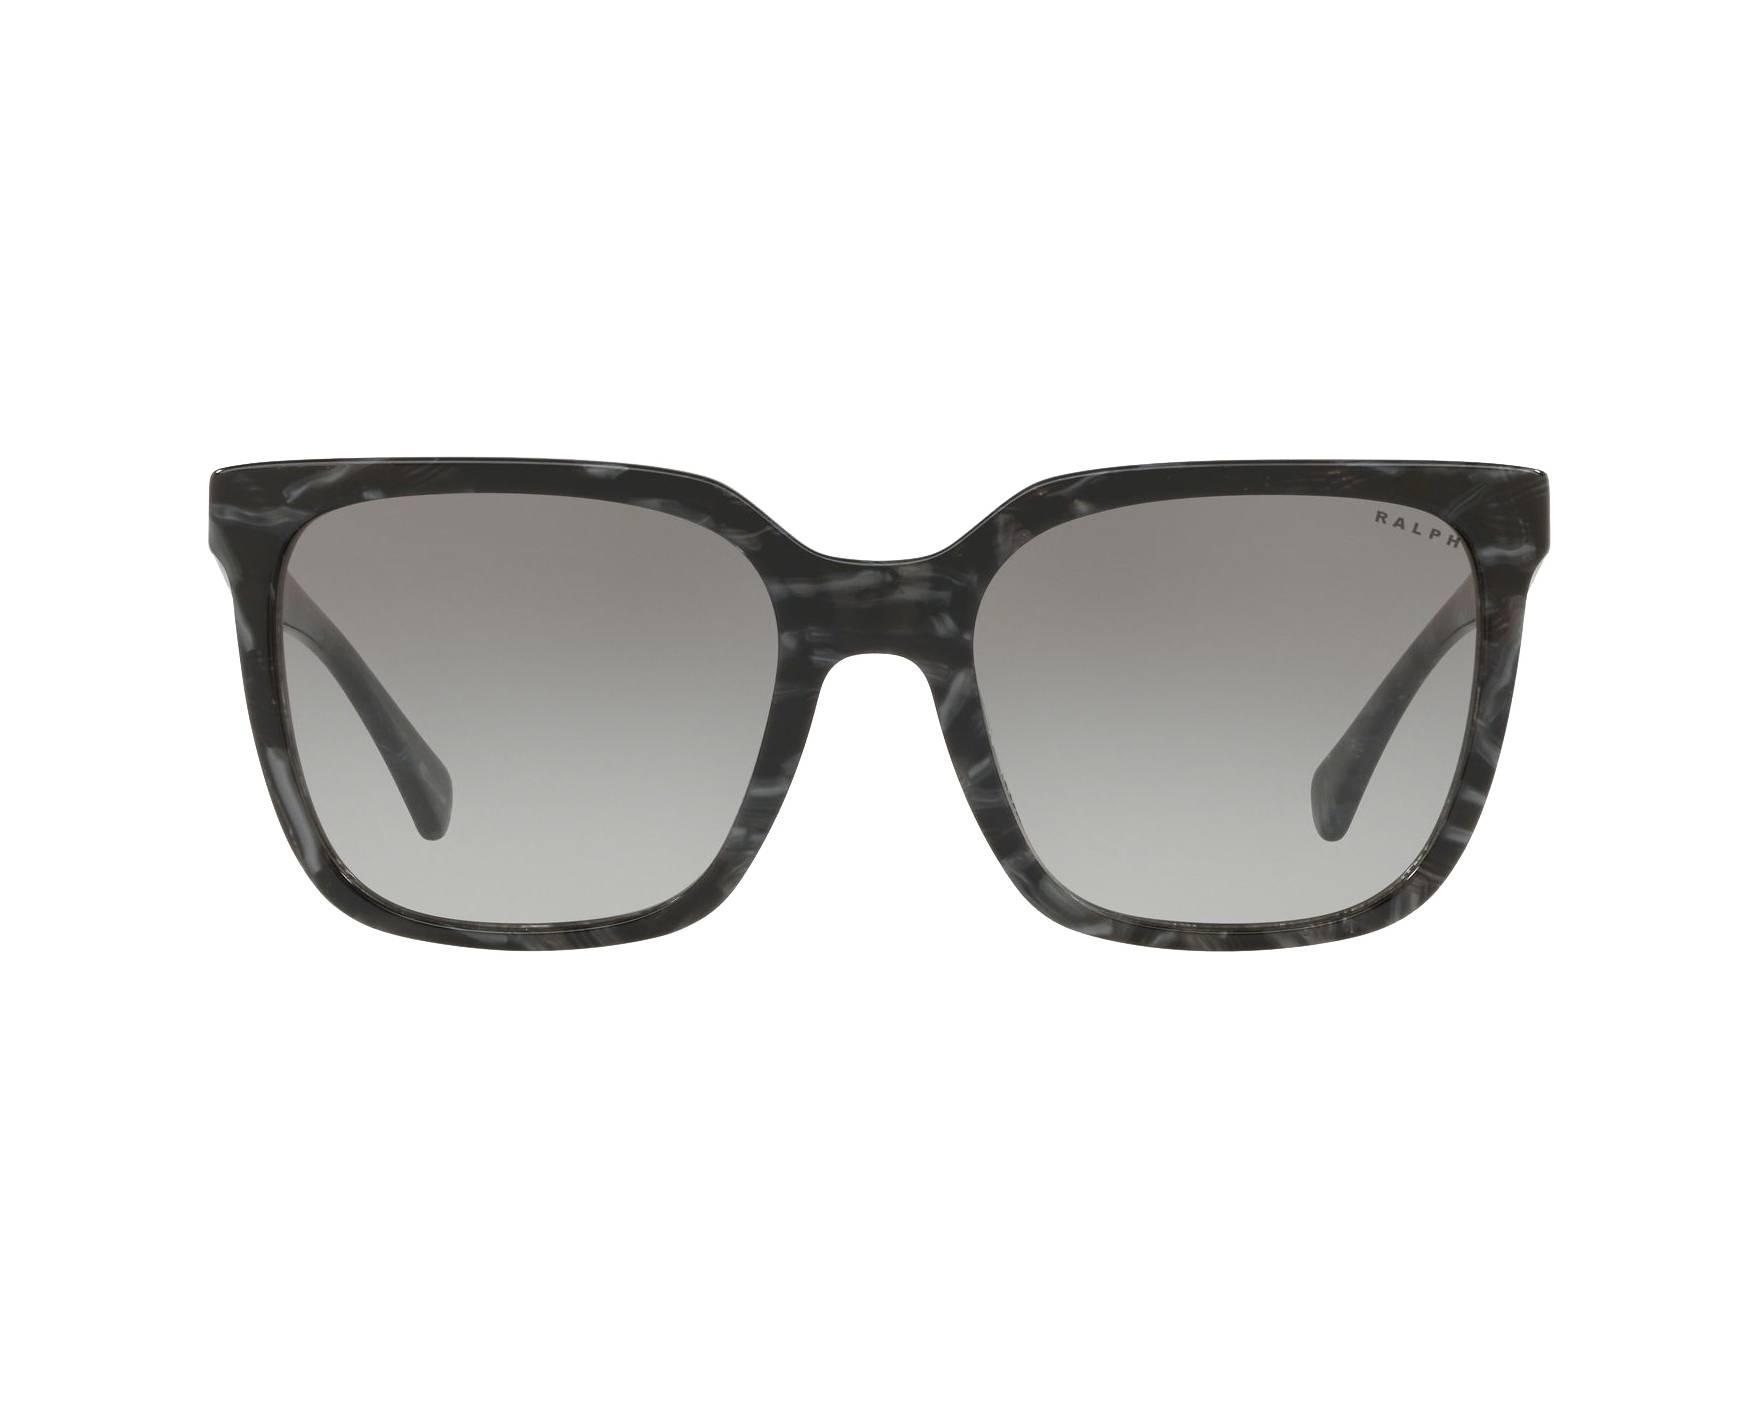 87d5e45faff9 Ralph Ra5223 57 Grey Sunglasses – Fondos de Pantalla